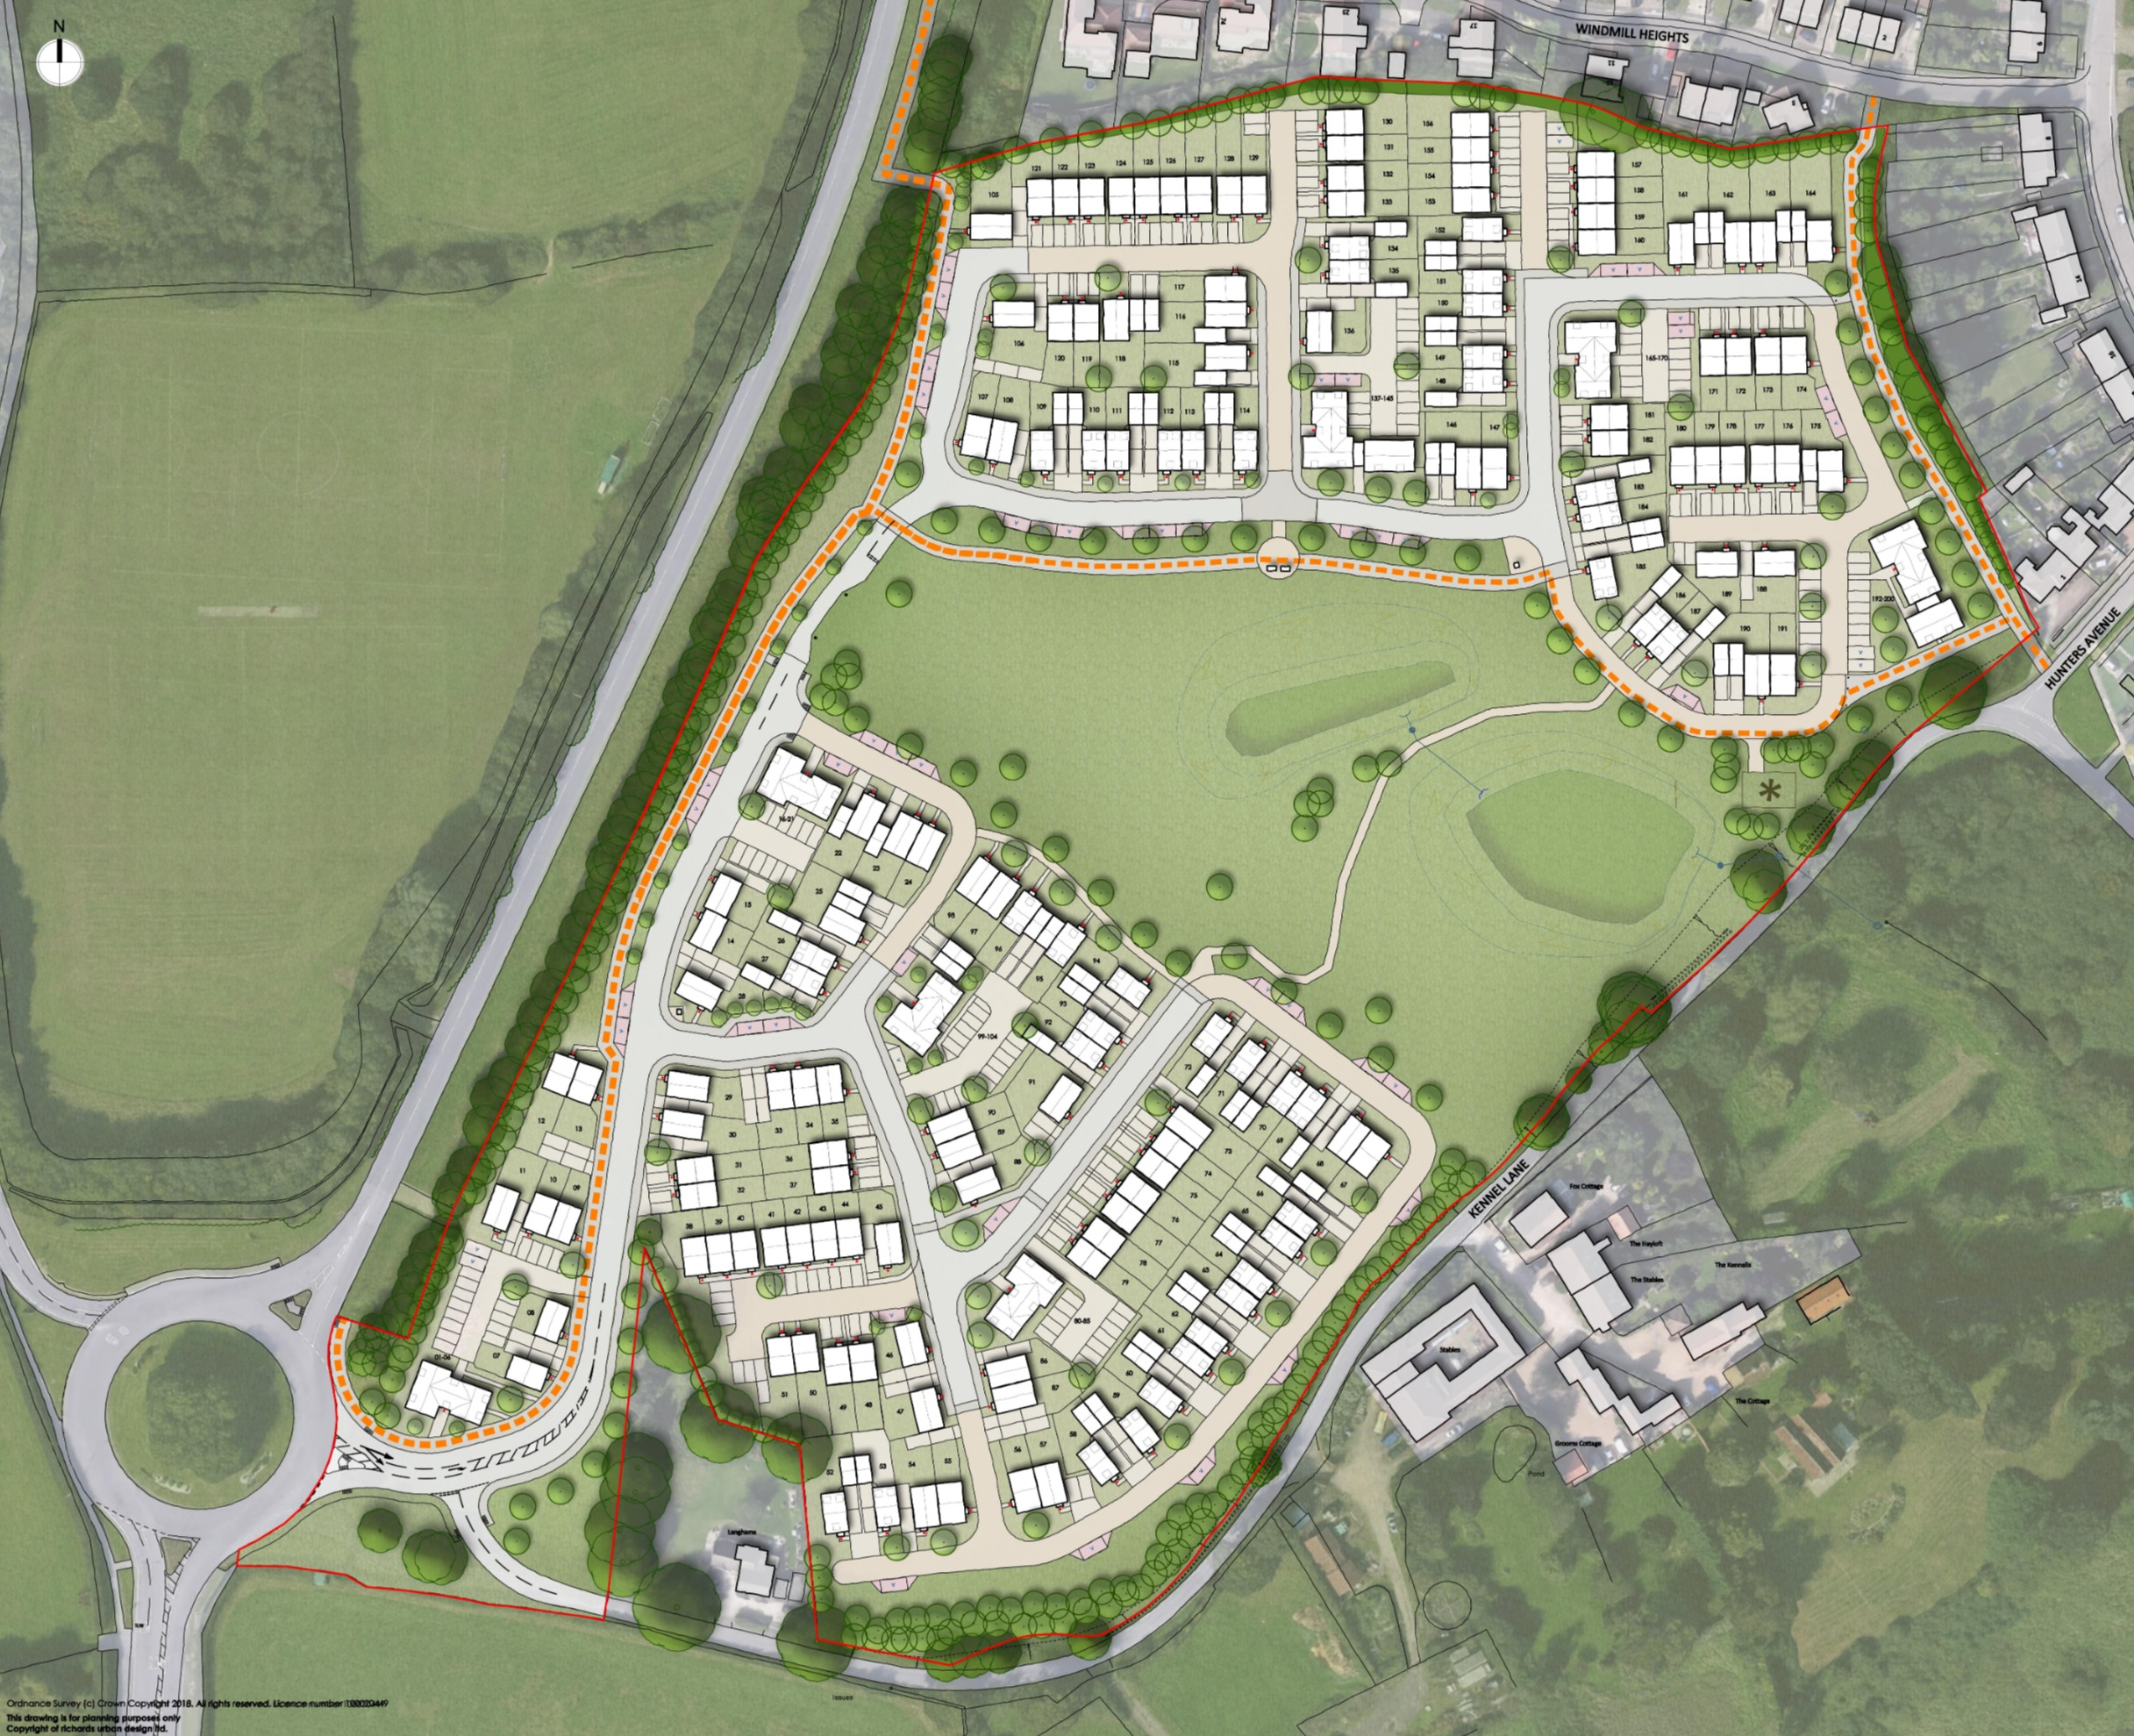 Billericay site layout plan.jpg